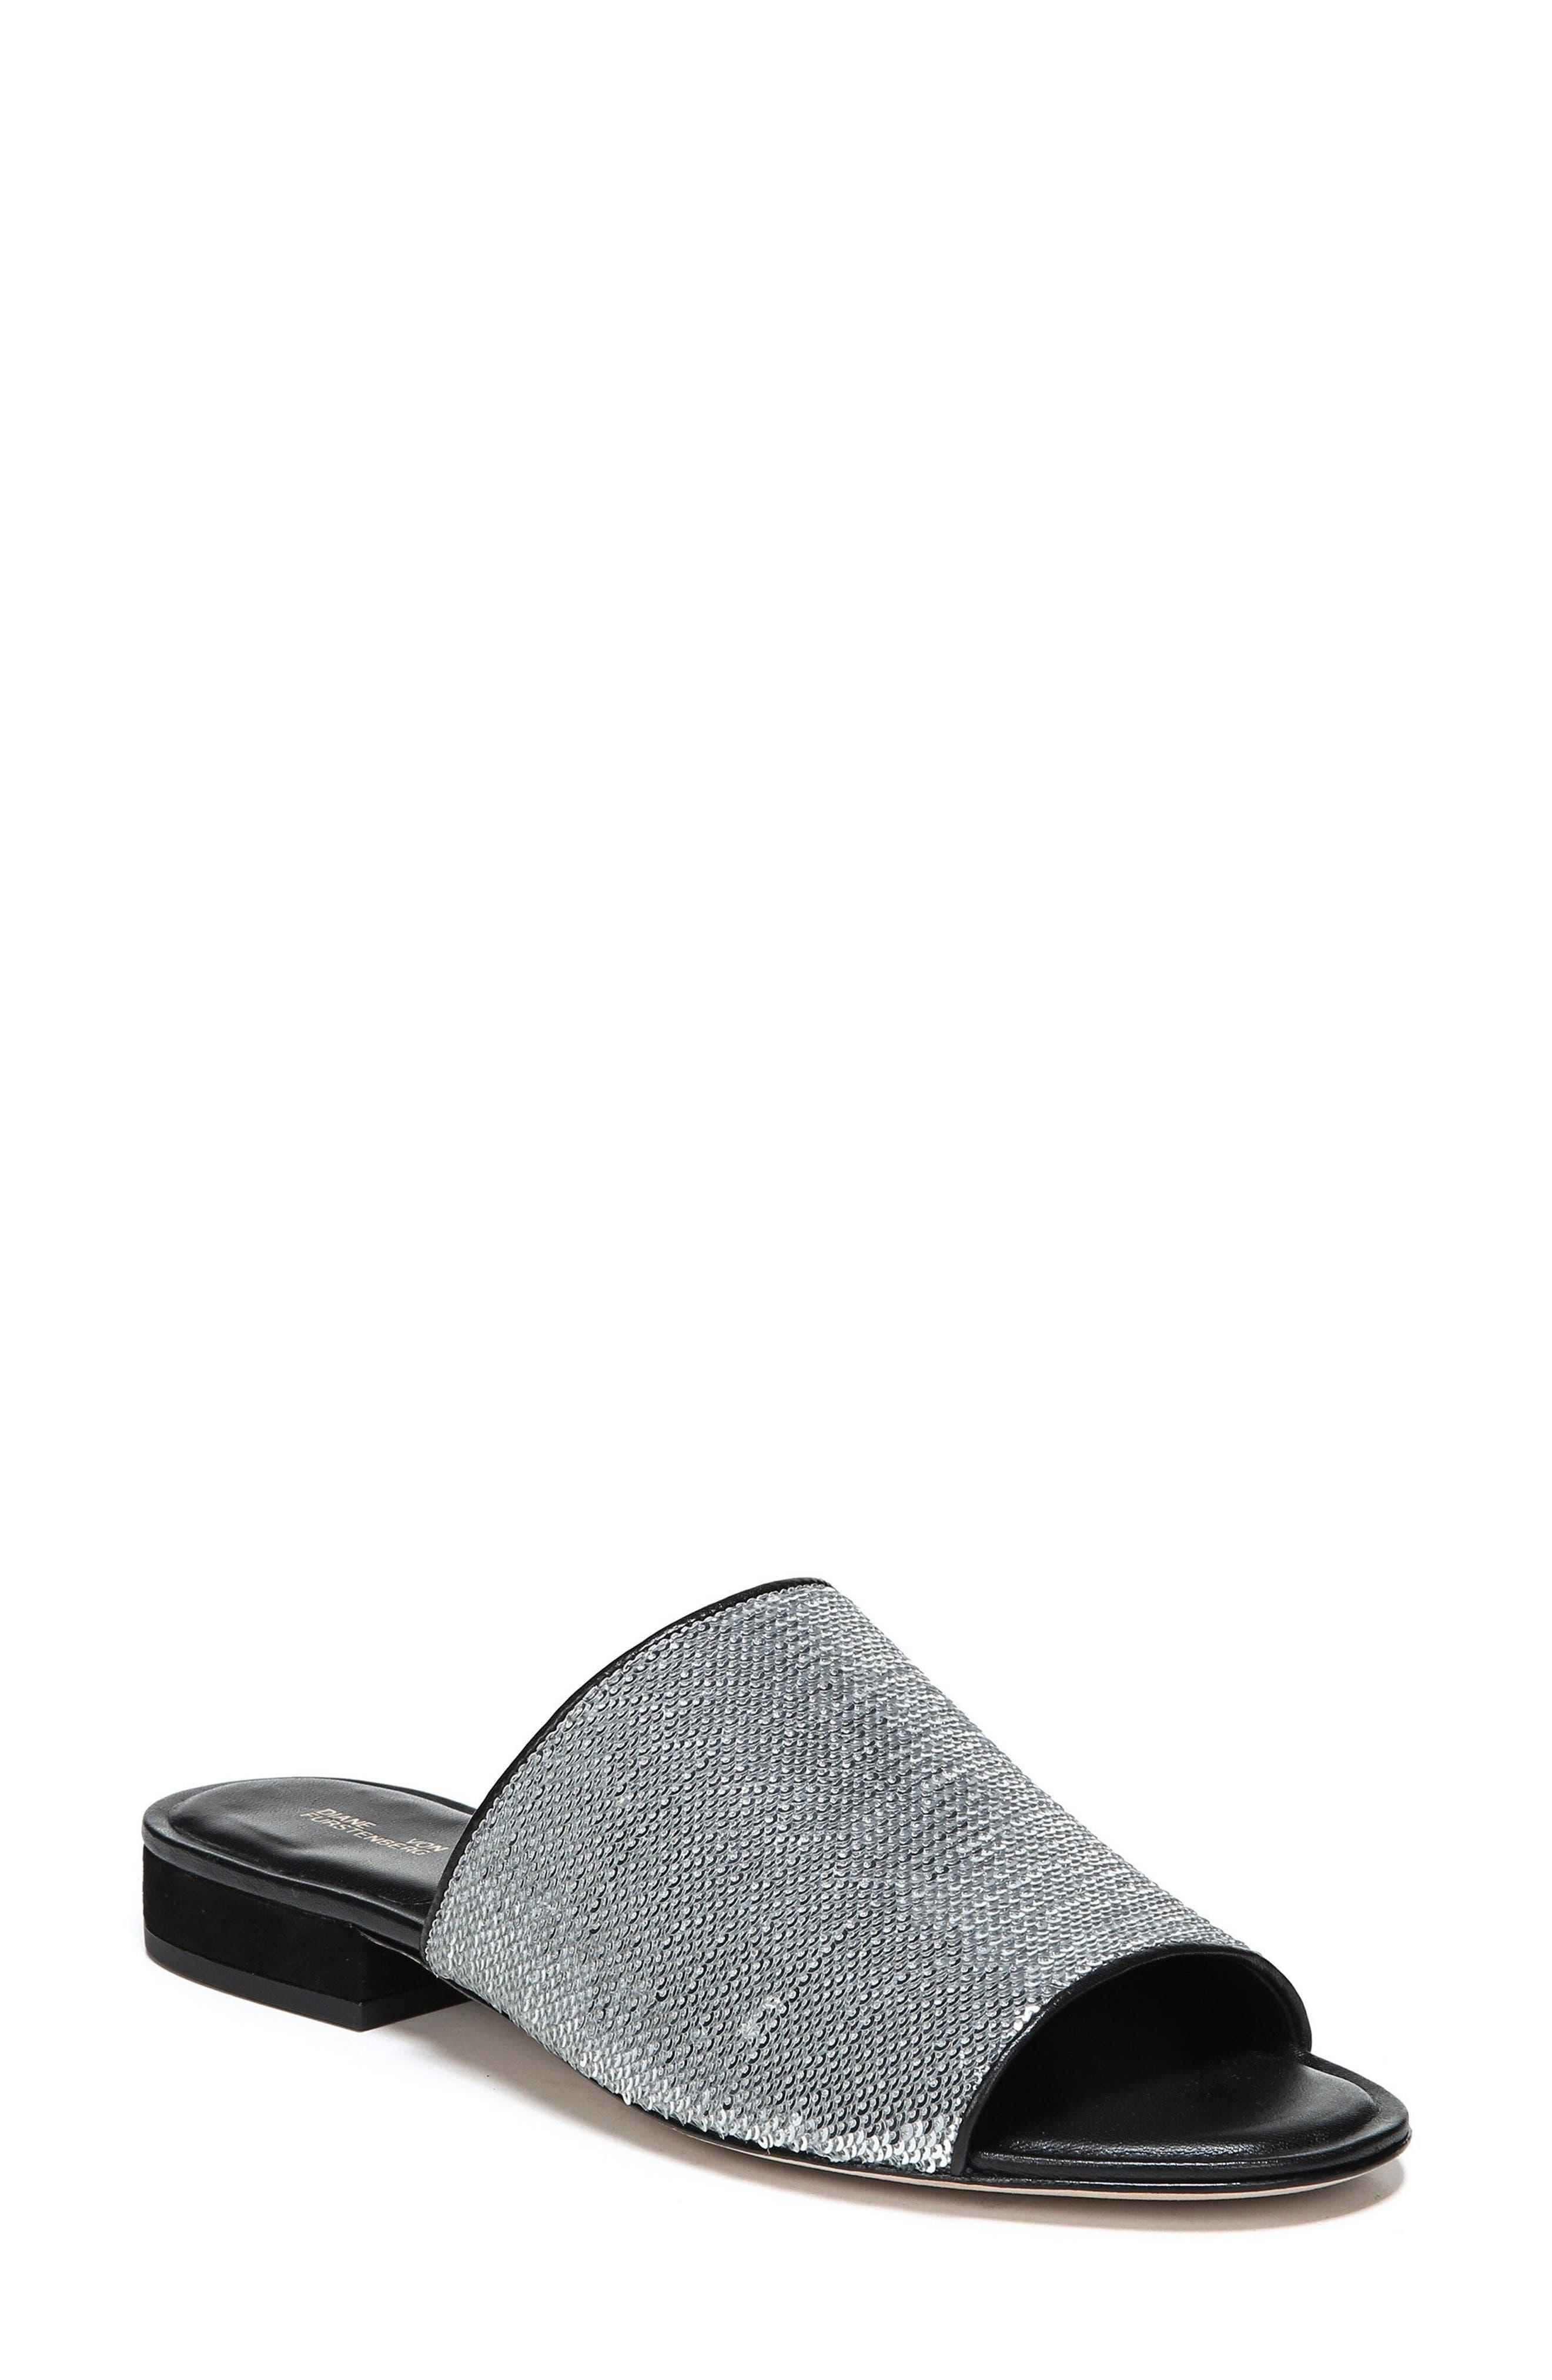 Main Image - Diane von Furstenberg Samassi 1 Slide Sandal (Women)